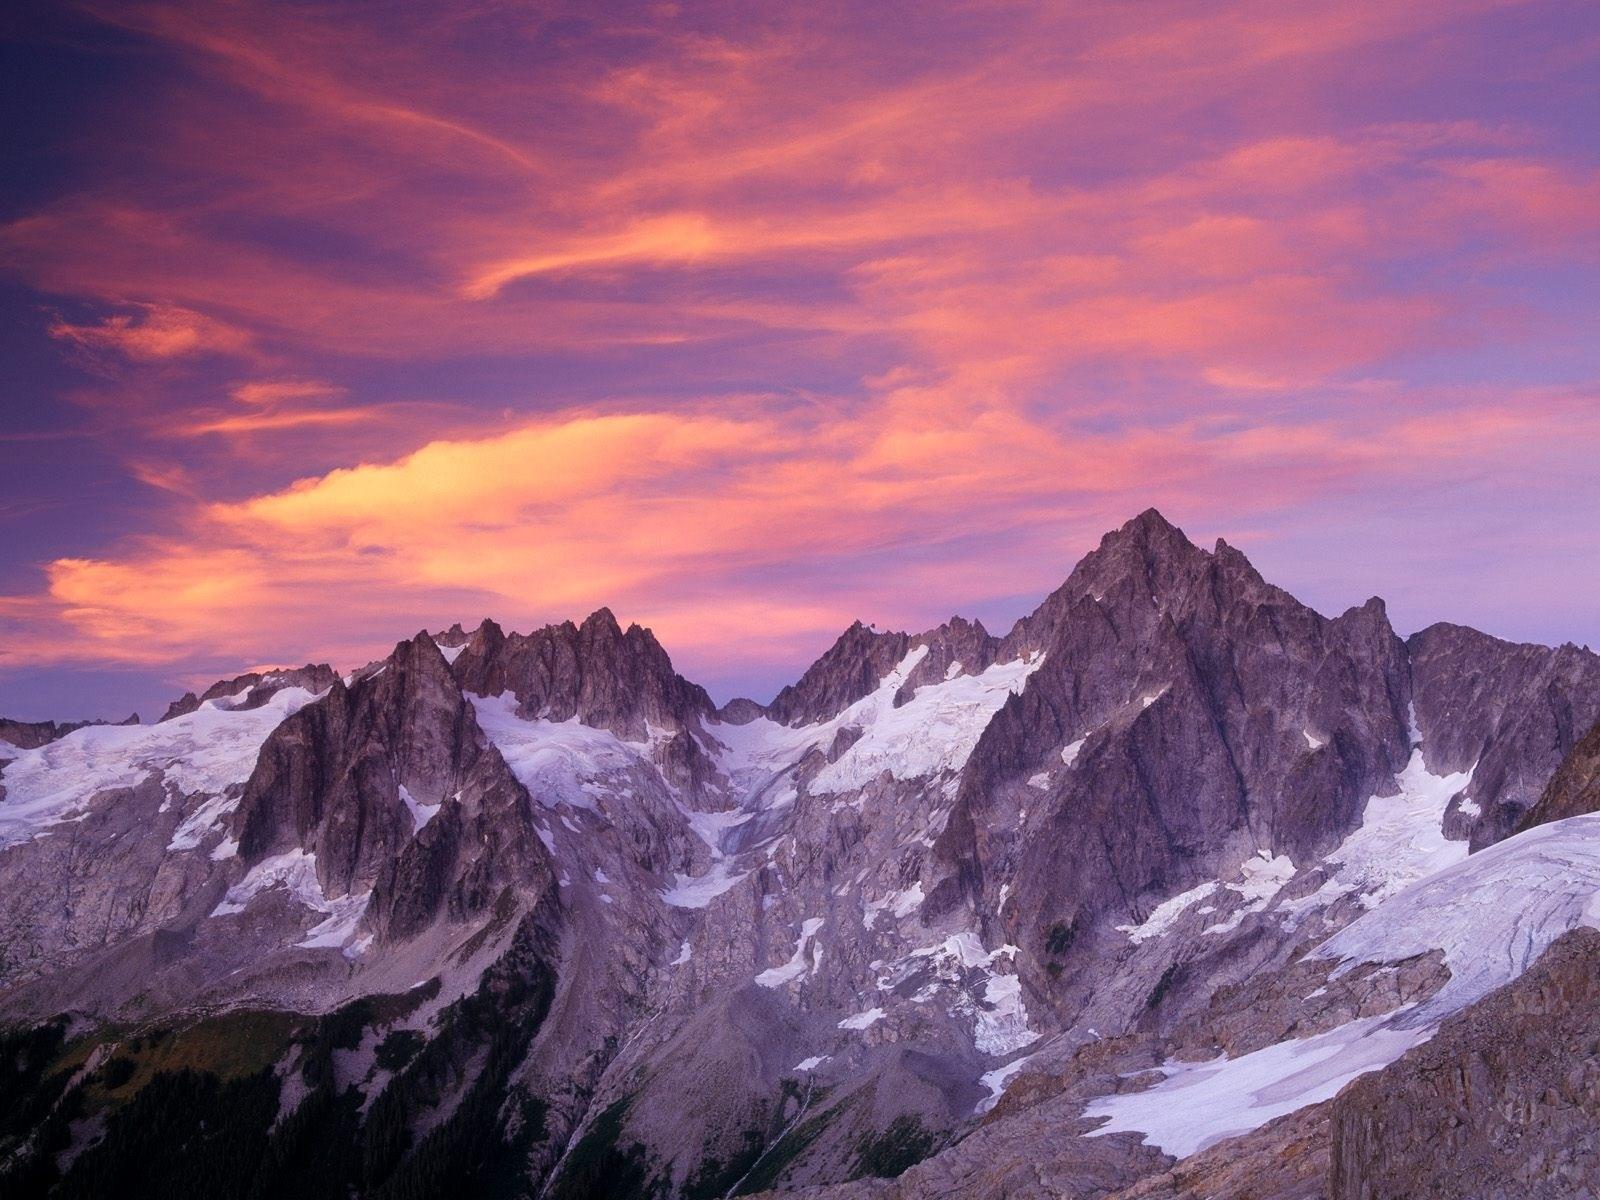 Winter Evening Mountains - [1600 x 1200]